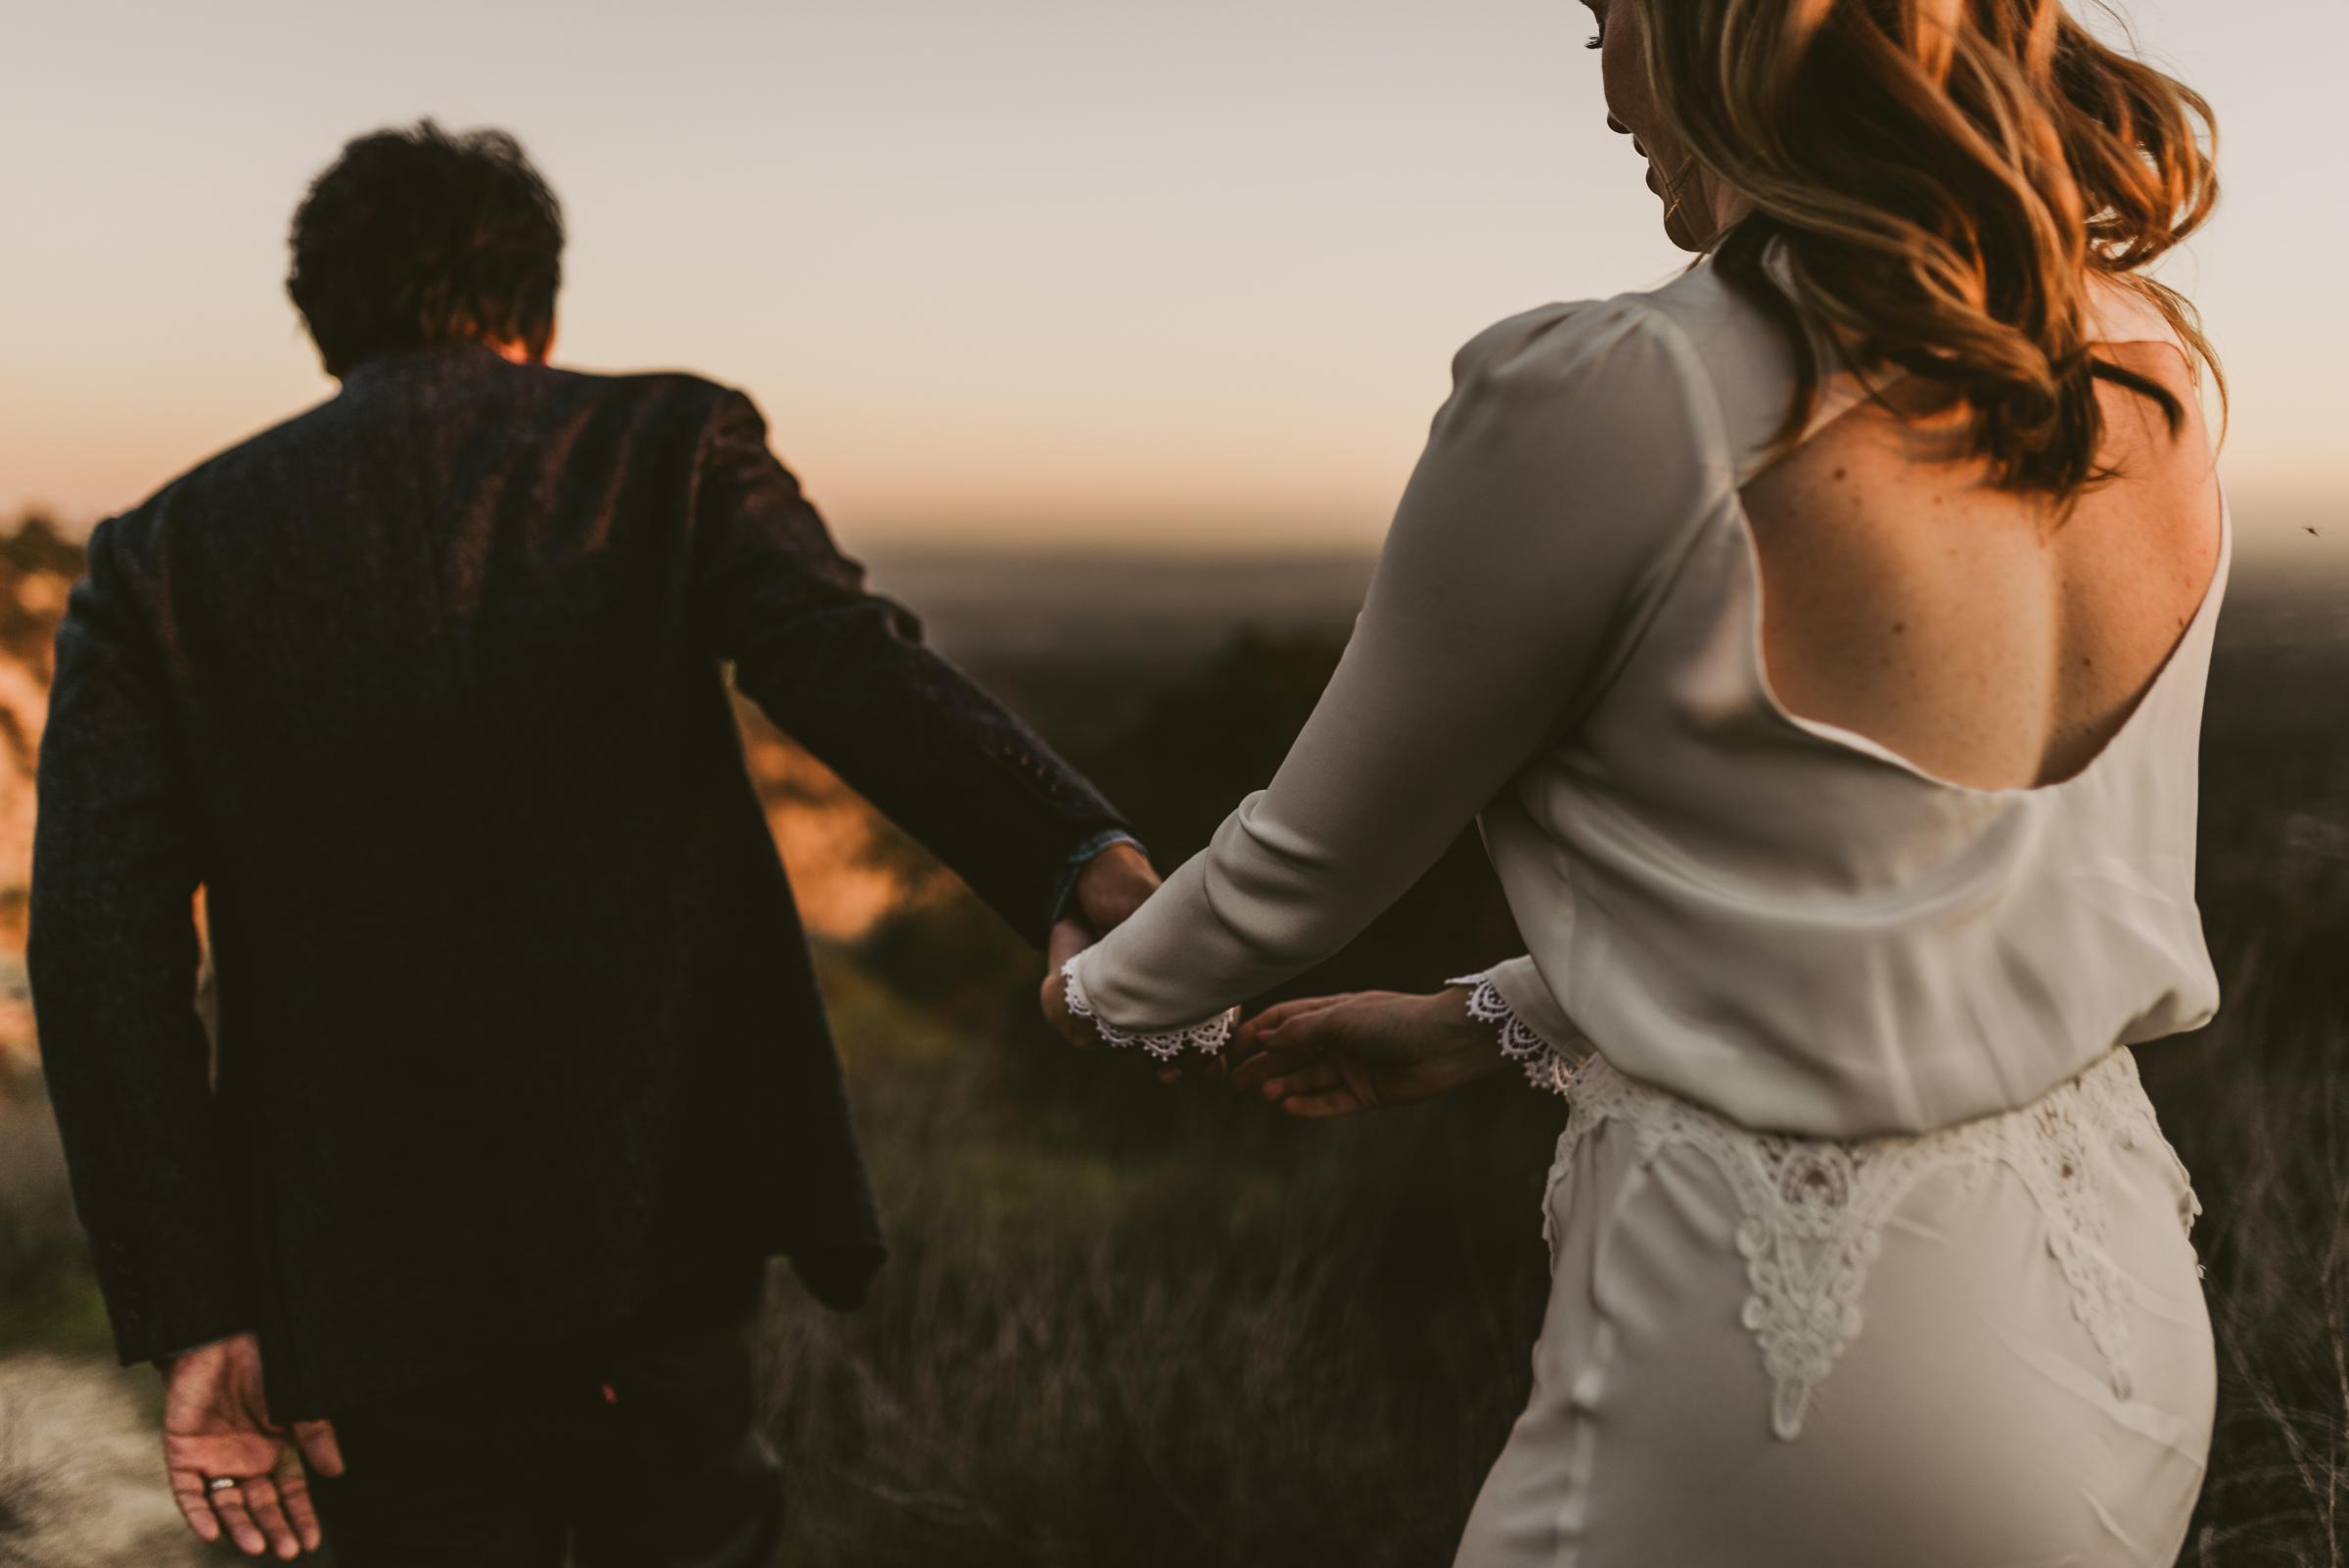 ©Isaiah + Taylor Photography - Intimate Elopement, Eaton Canyon, Los Angeles Wedding Photographer-109.jpg